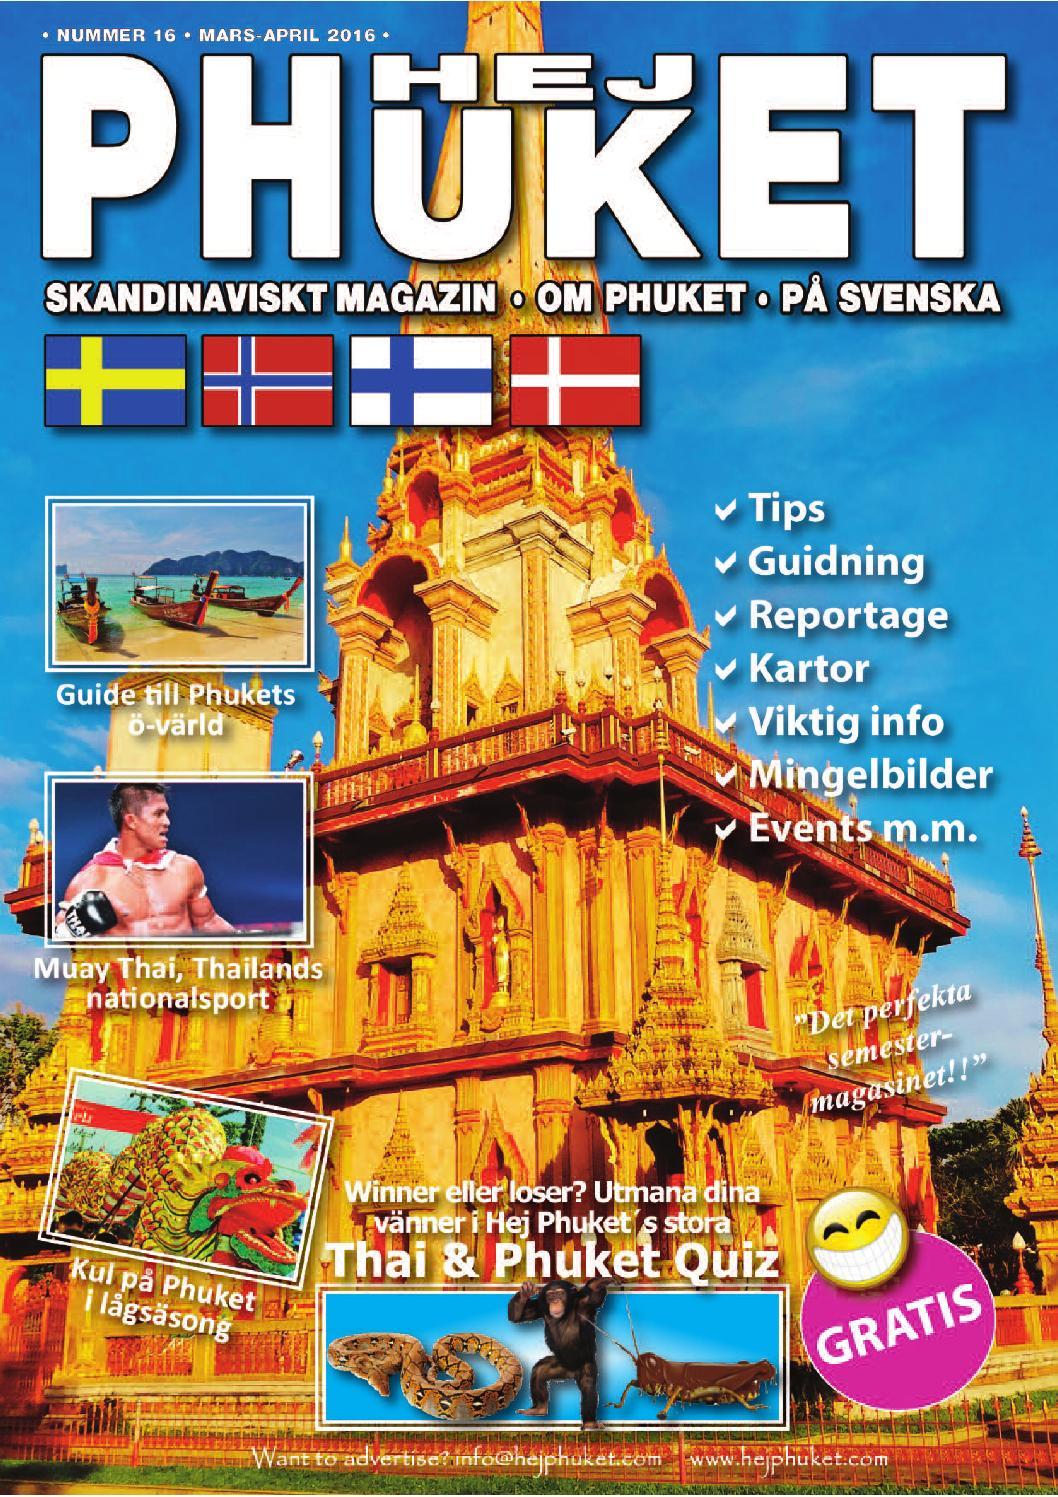 transa göteborg stockholms bästa thai